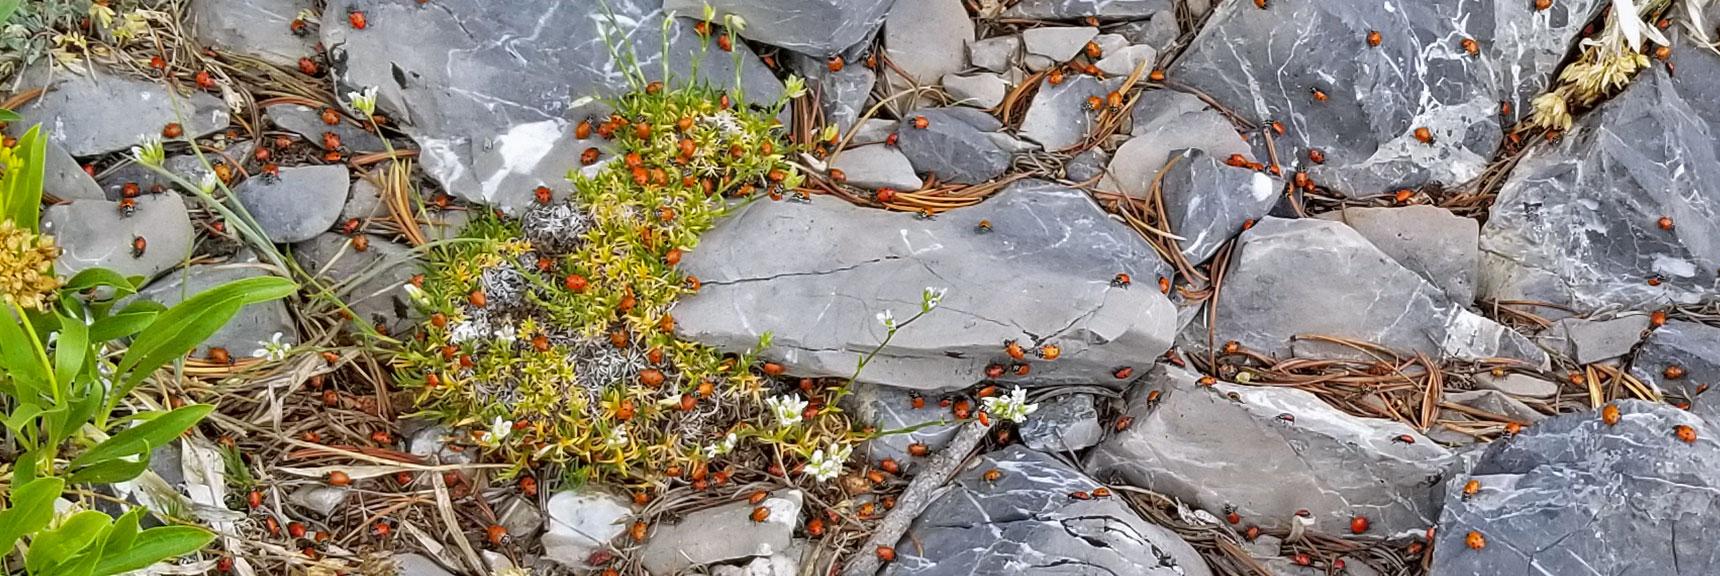 Ladybug Swarm on Harris Mountain Summit | Six Peak Circuit Adventure in the Spring Mountains, Nevada